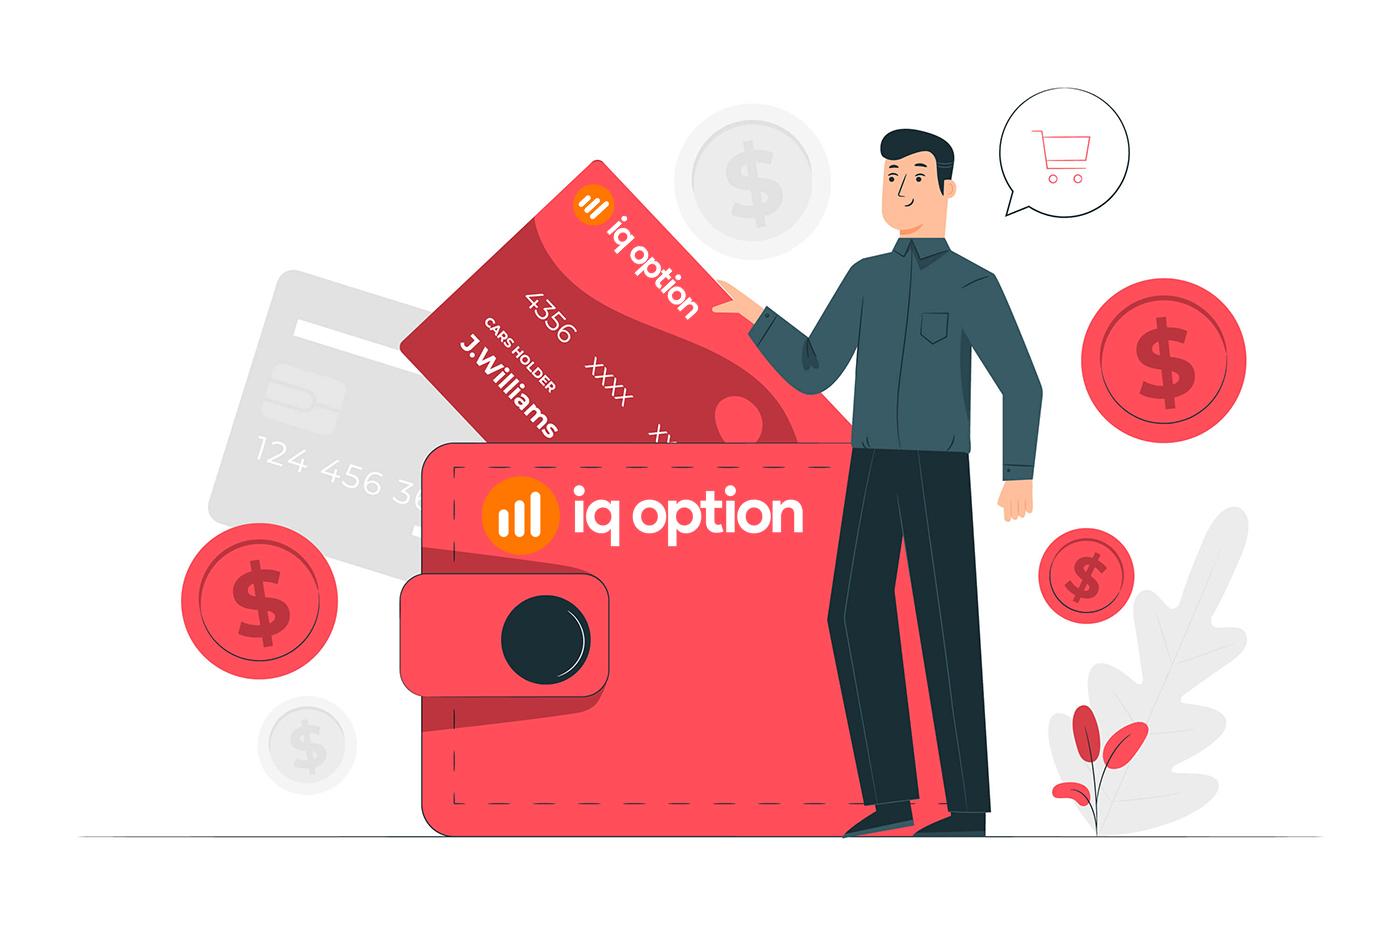 IQ Option에서 계좌를 개설하고 돈을 인출하는 방법